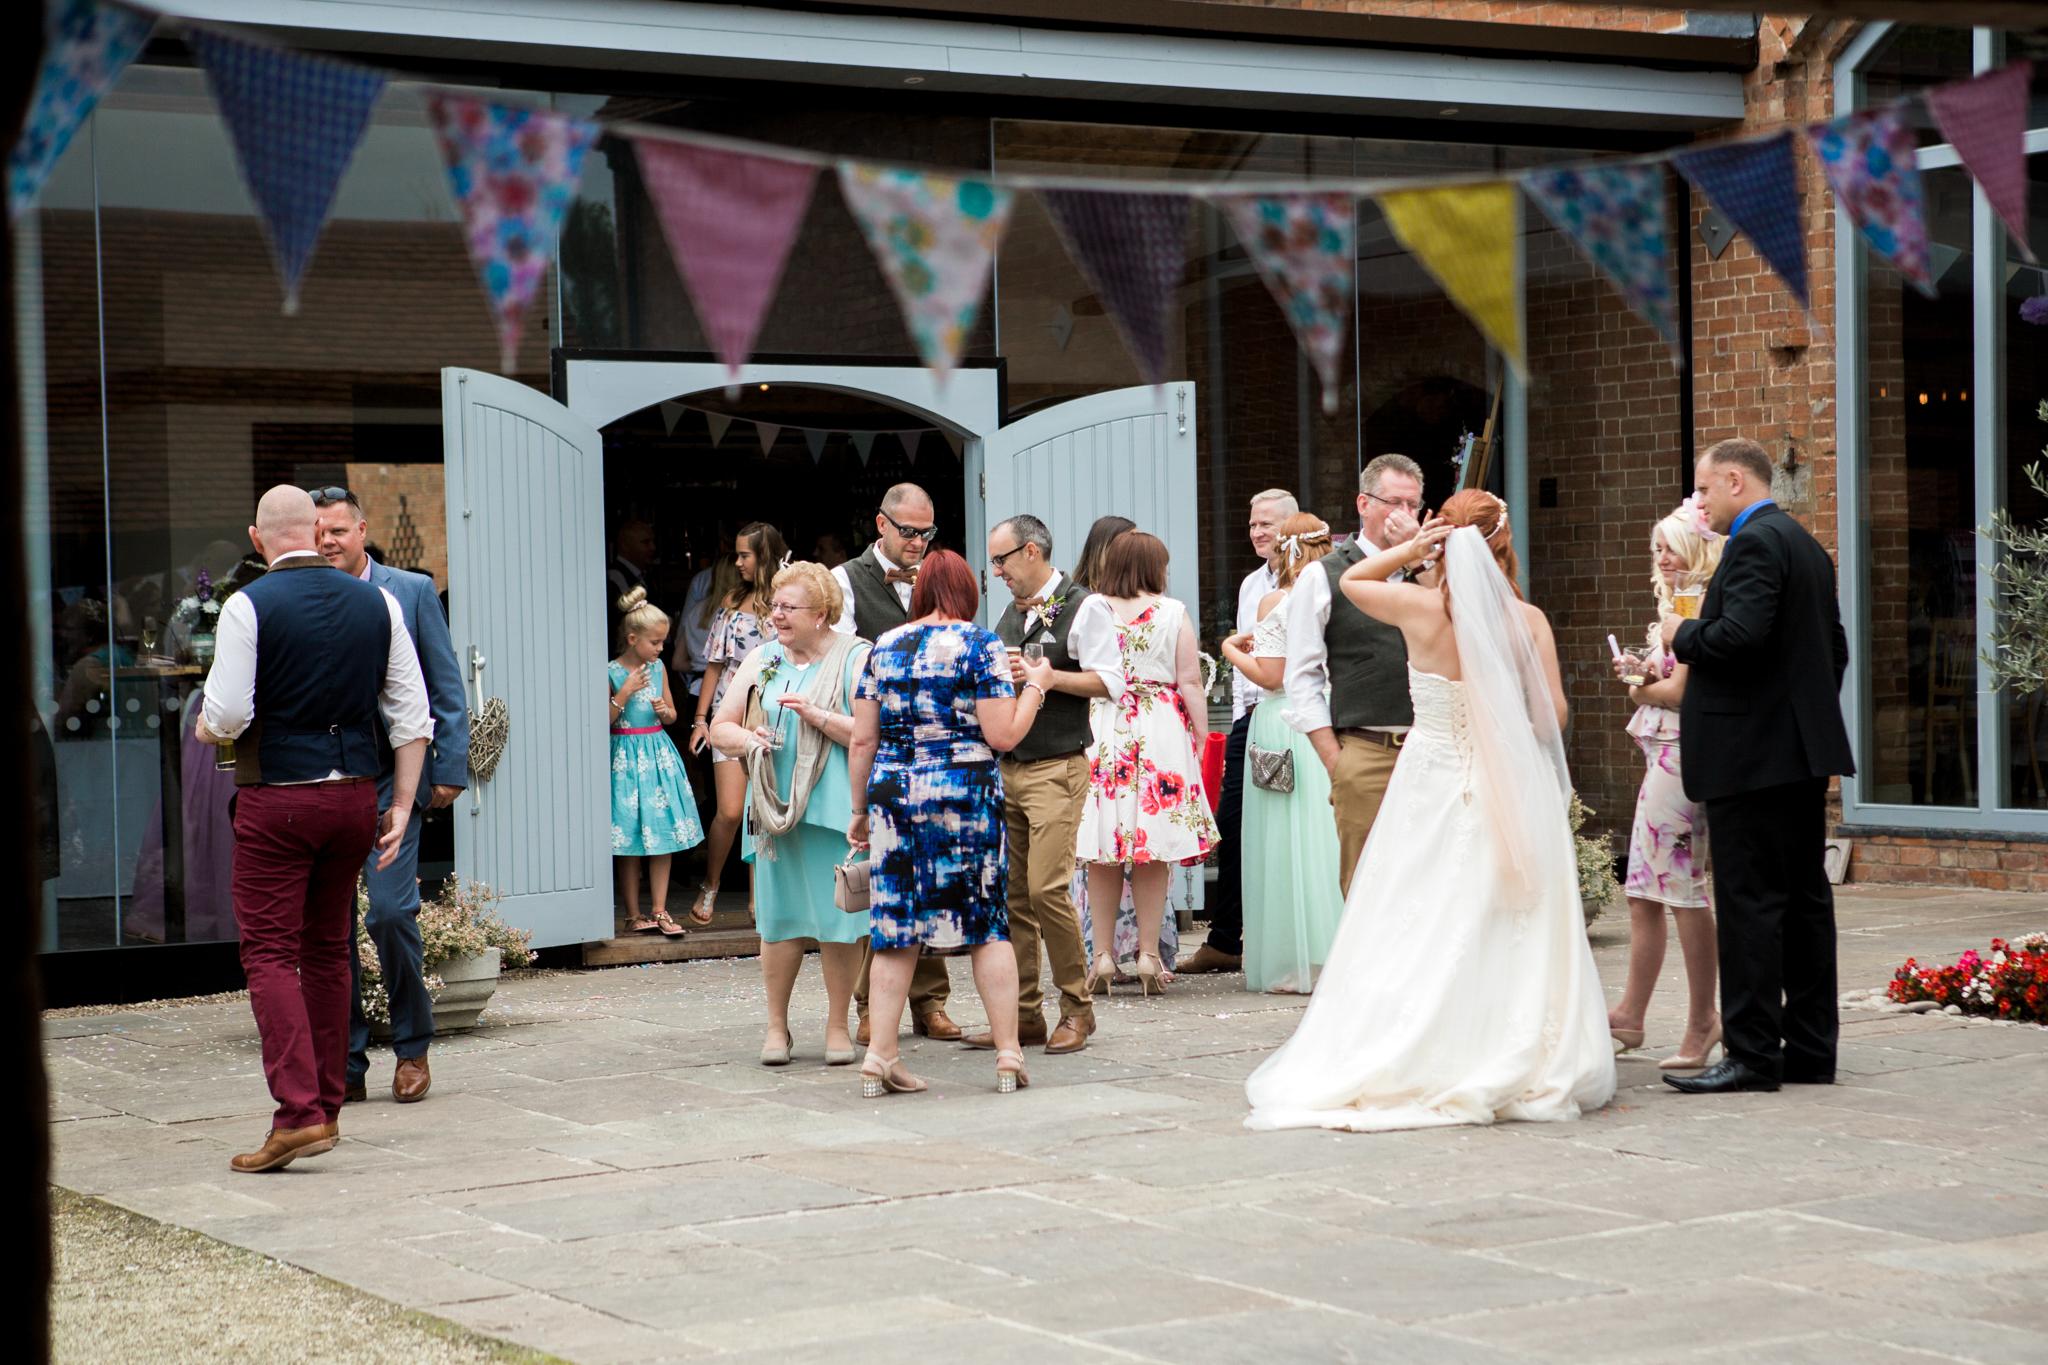 Rowsie & Lee, Swallows Nest Barn Wedding, Cotswold wedding photographer, Warwickshire Wedding Photographer-117.jpg